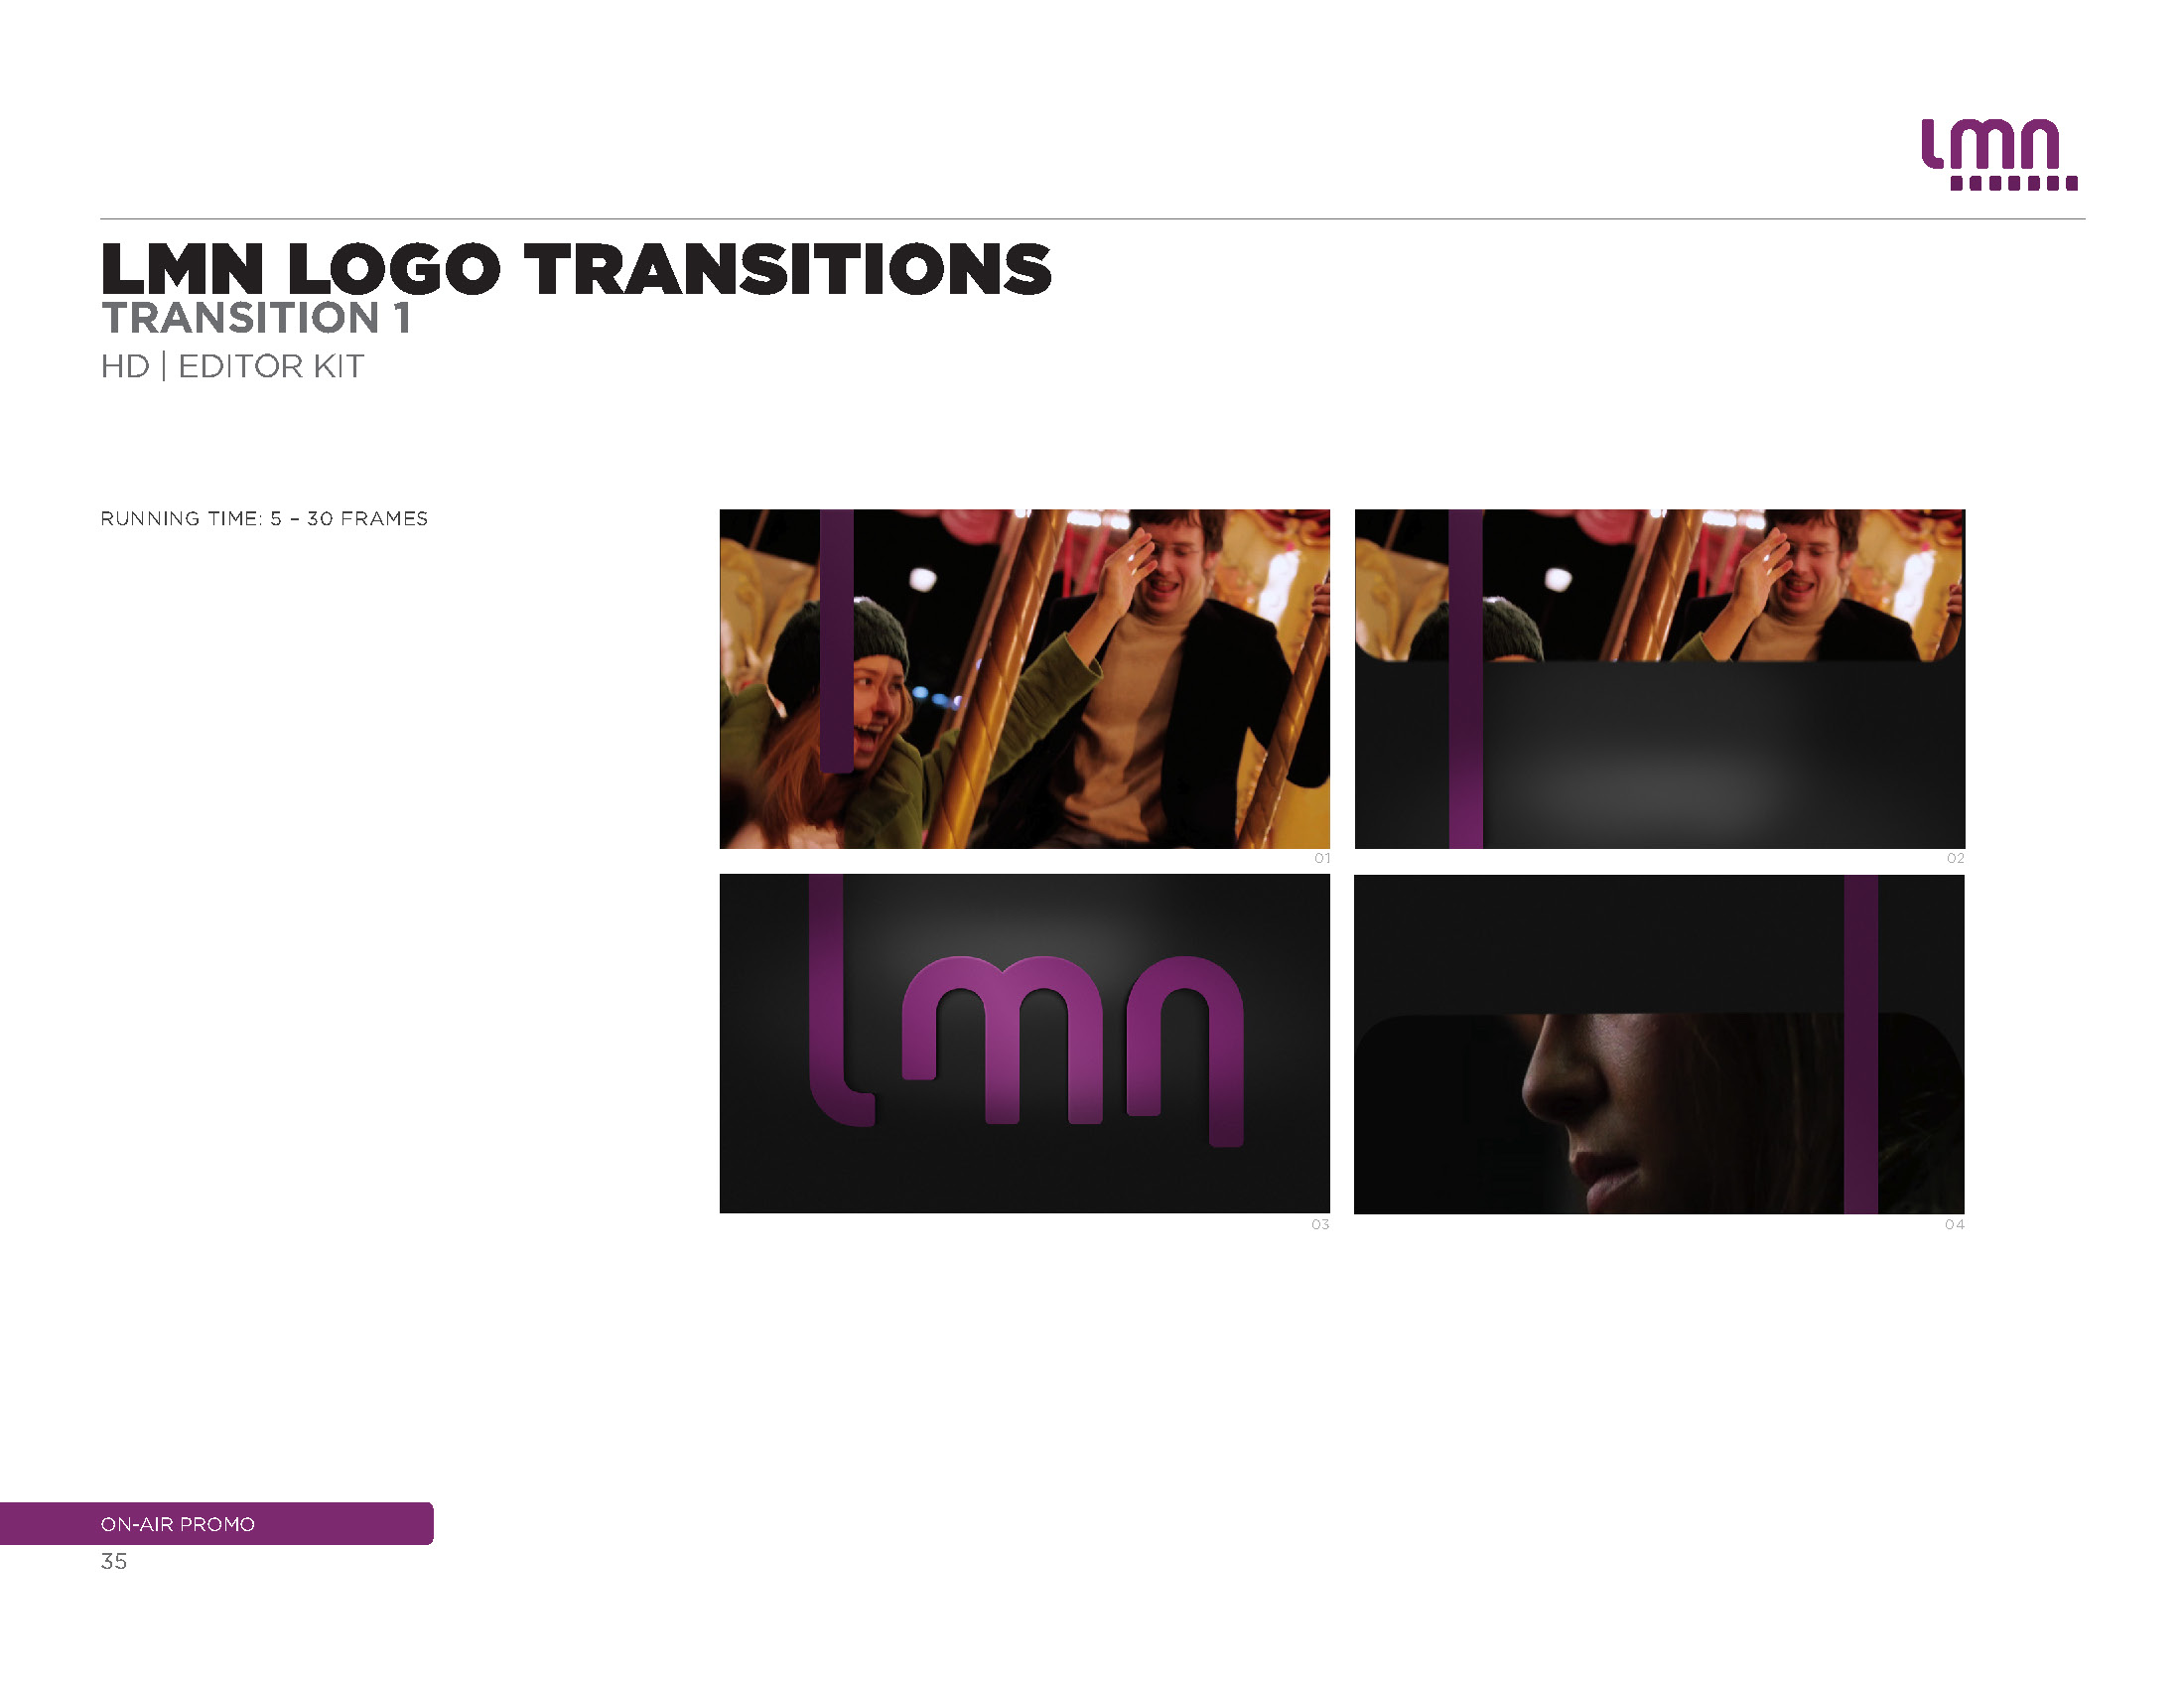 LMN_styleguide_092711_HQ_Page_35.jpg